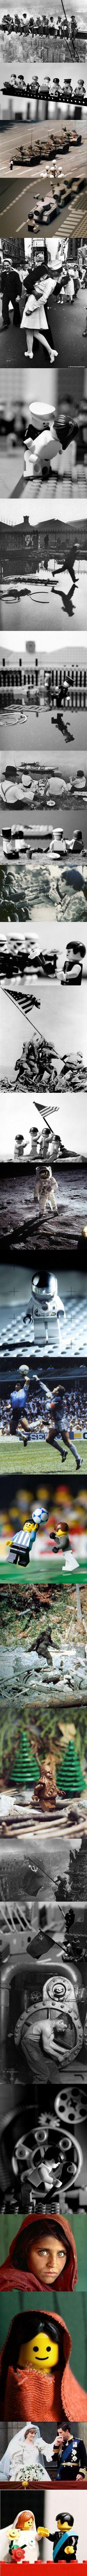 14 Classic Photographs Recreated In Lego - so funny! Lego Sculptures, Lego Minifigs, Arte Cyberpunk, Photo Images, Lego Worlds, Lego Photography, Nerd, Lego Design, Design Poster